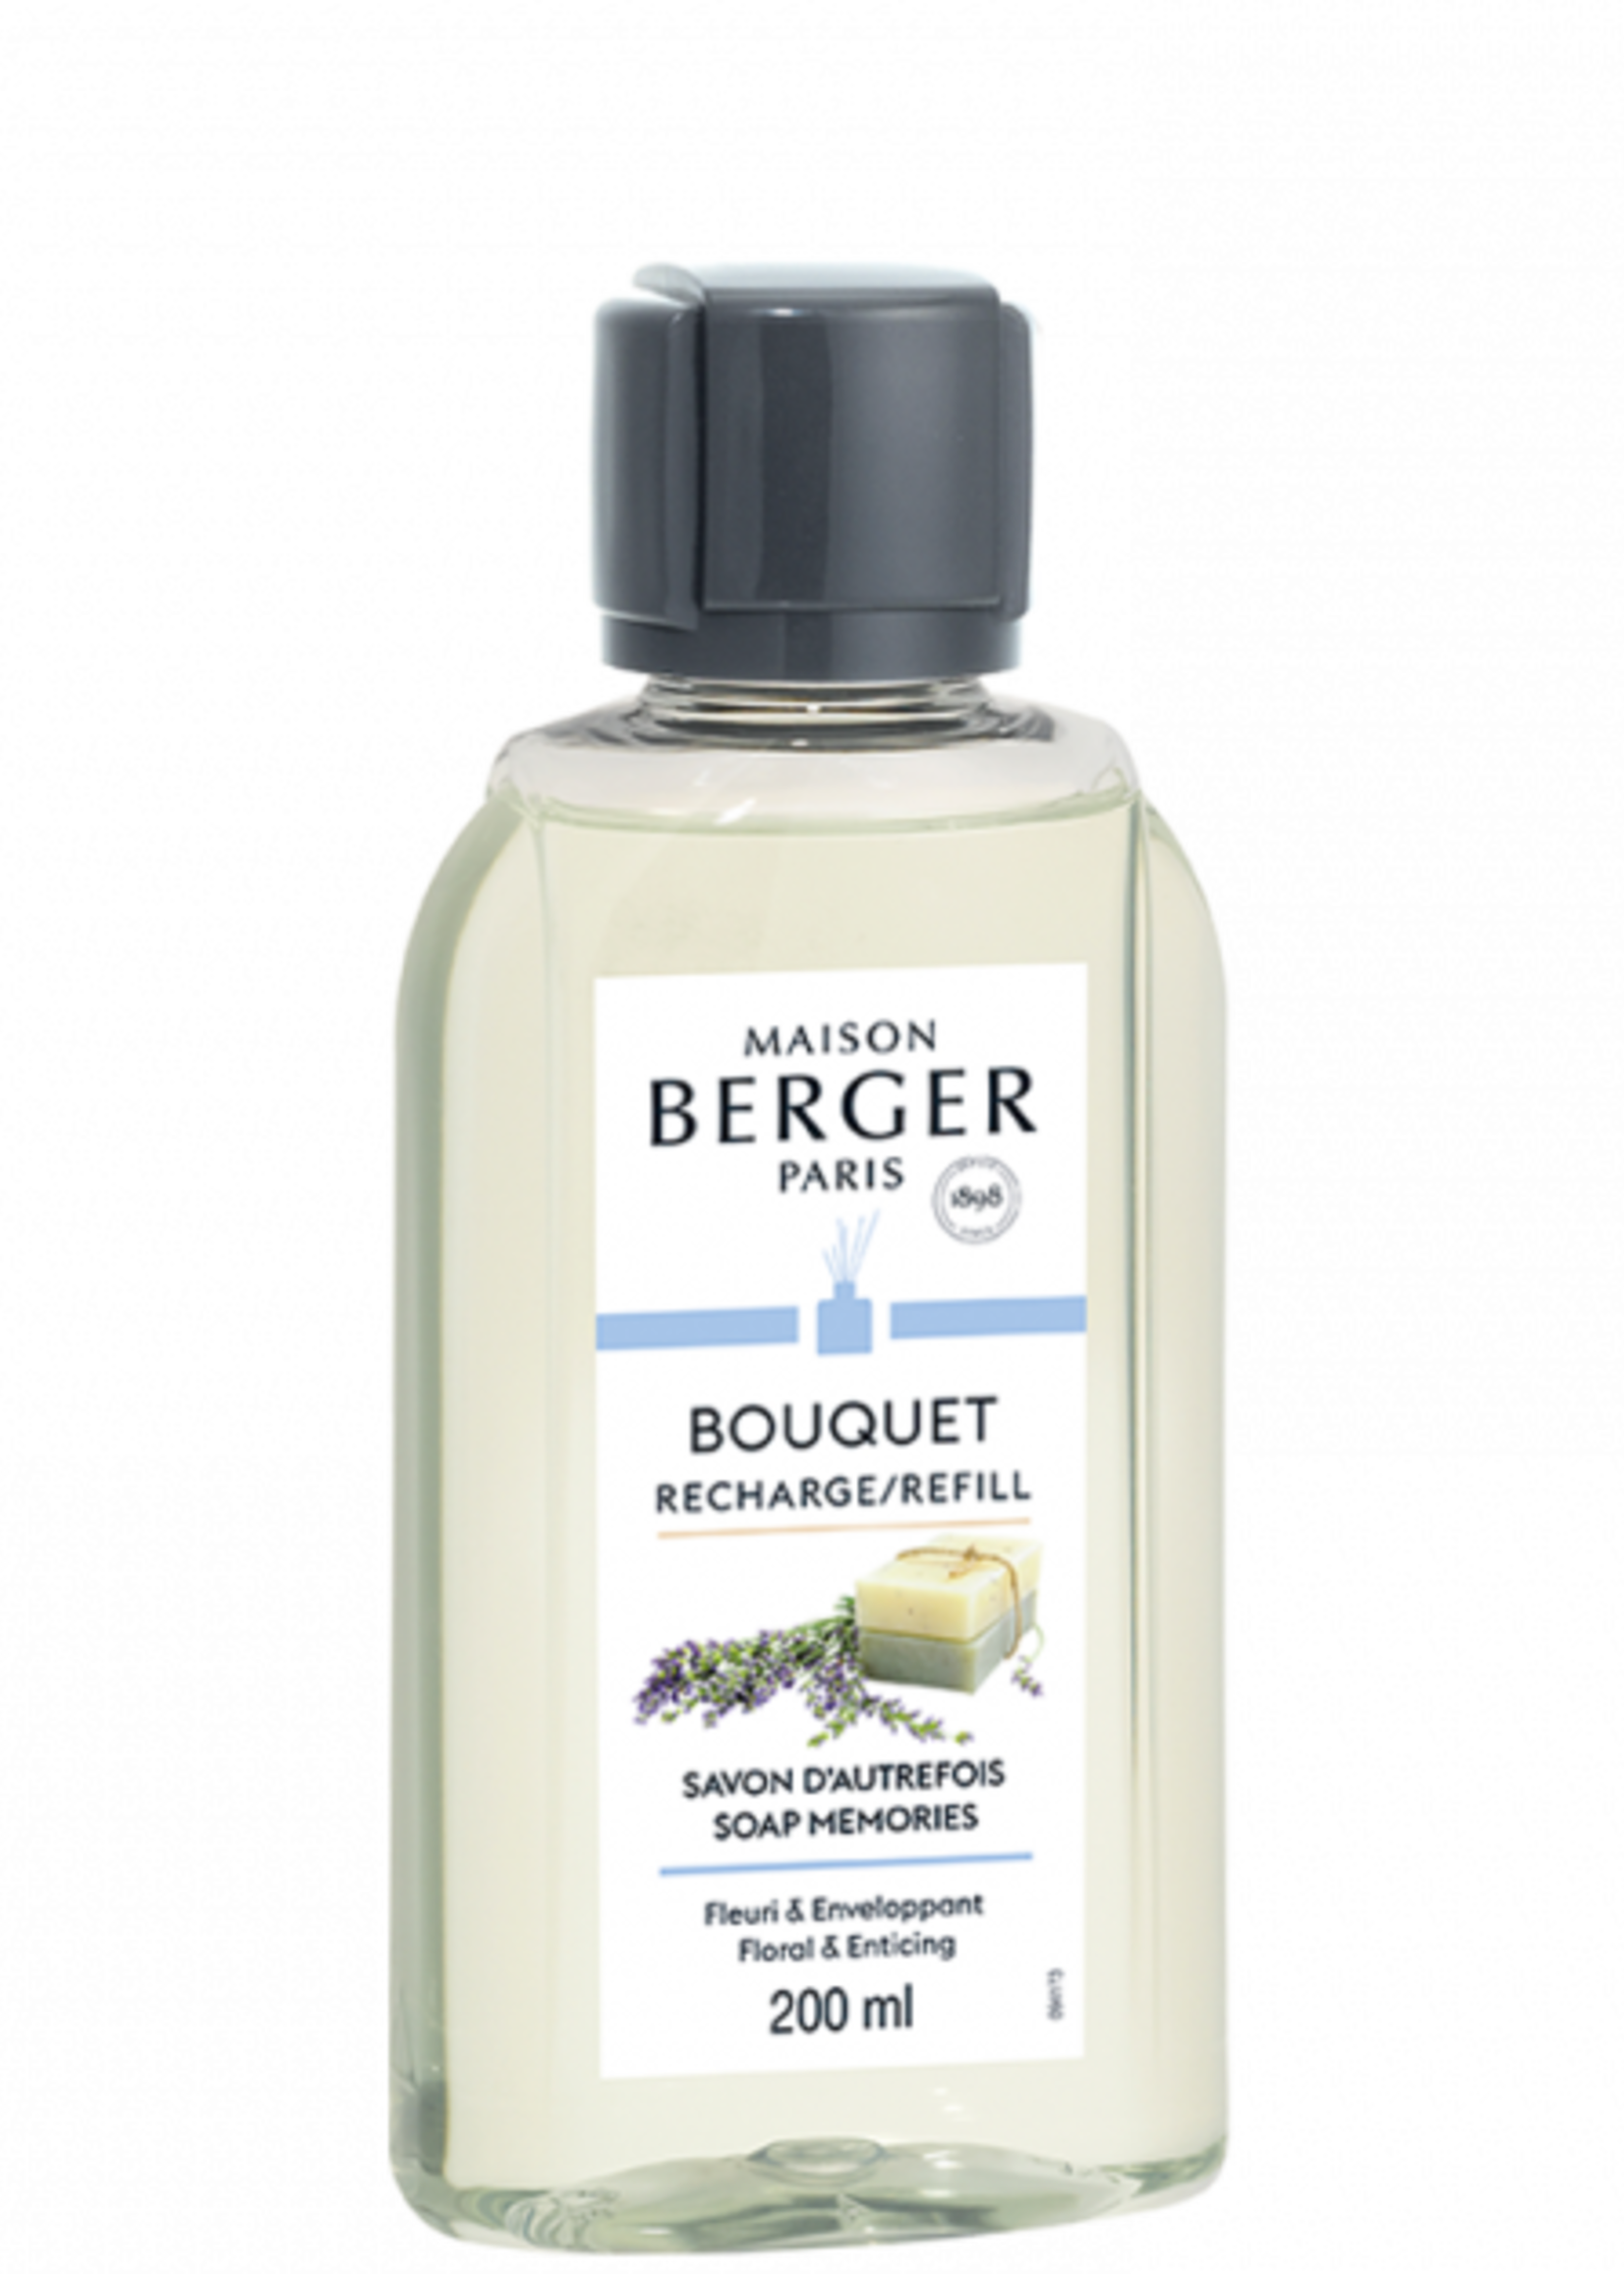 Parfum de Berger Navulling  Parfumverspreider Savon d'Autrefois